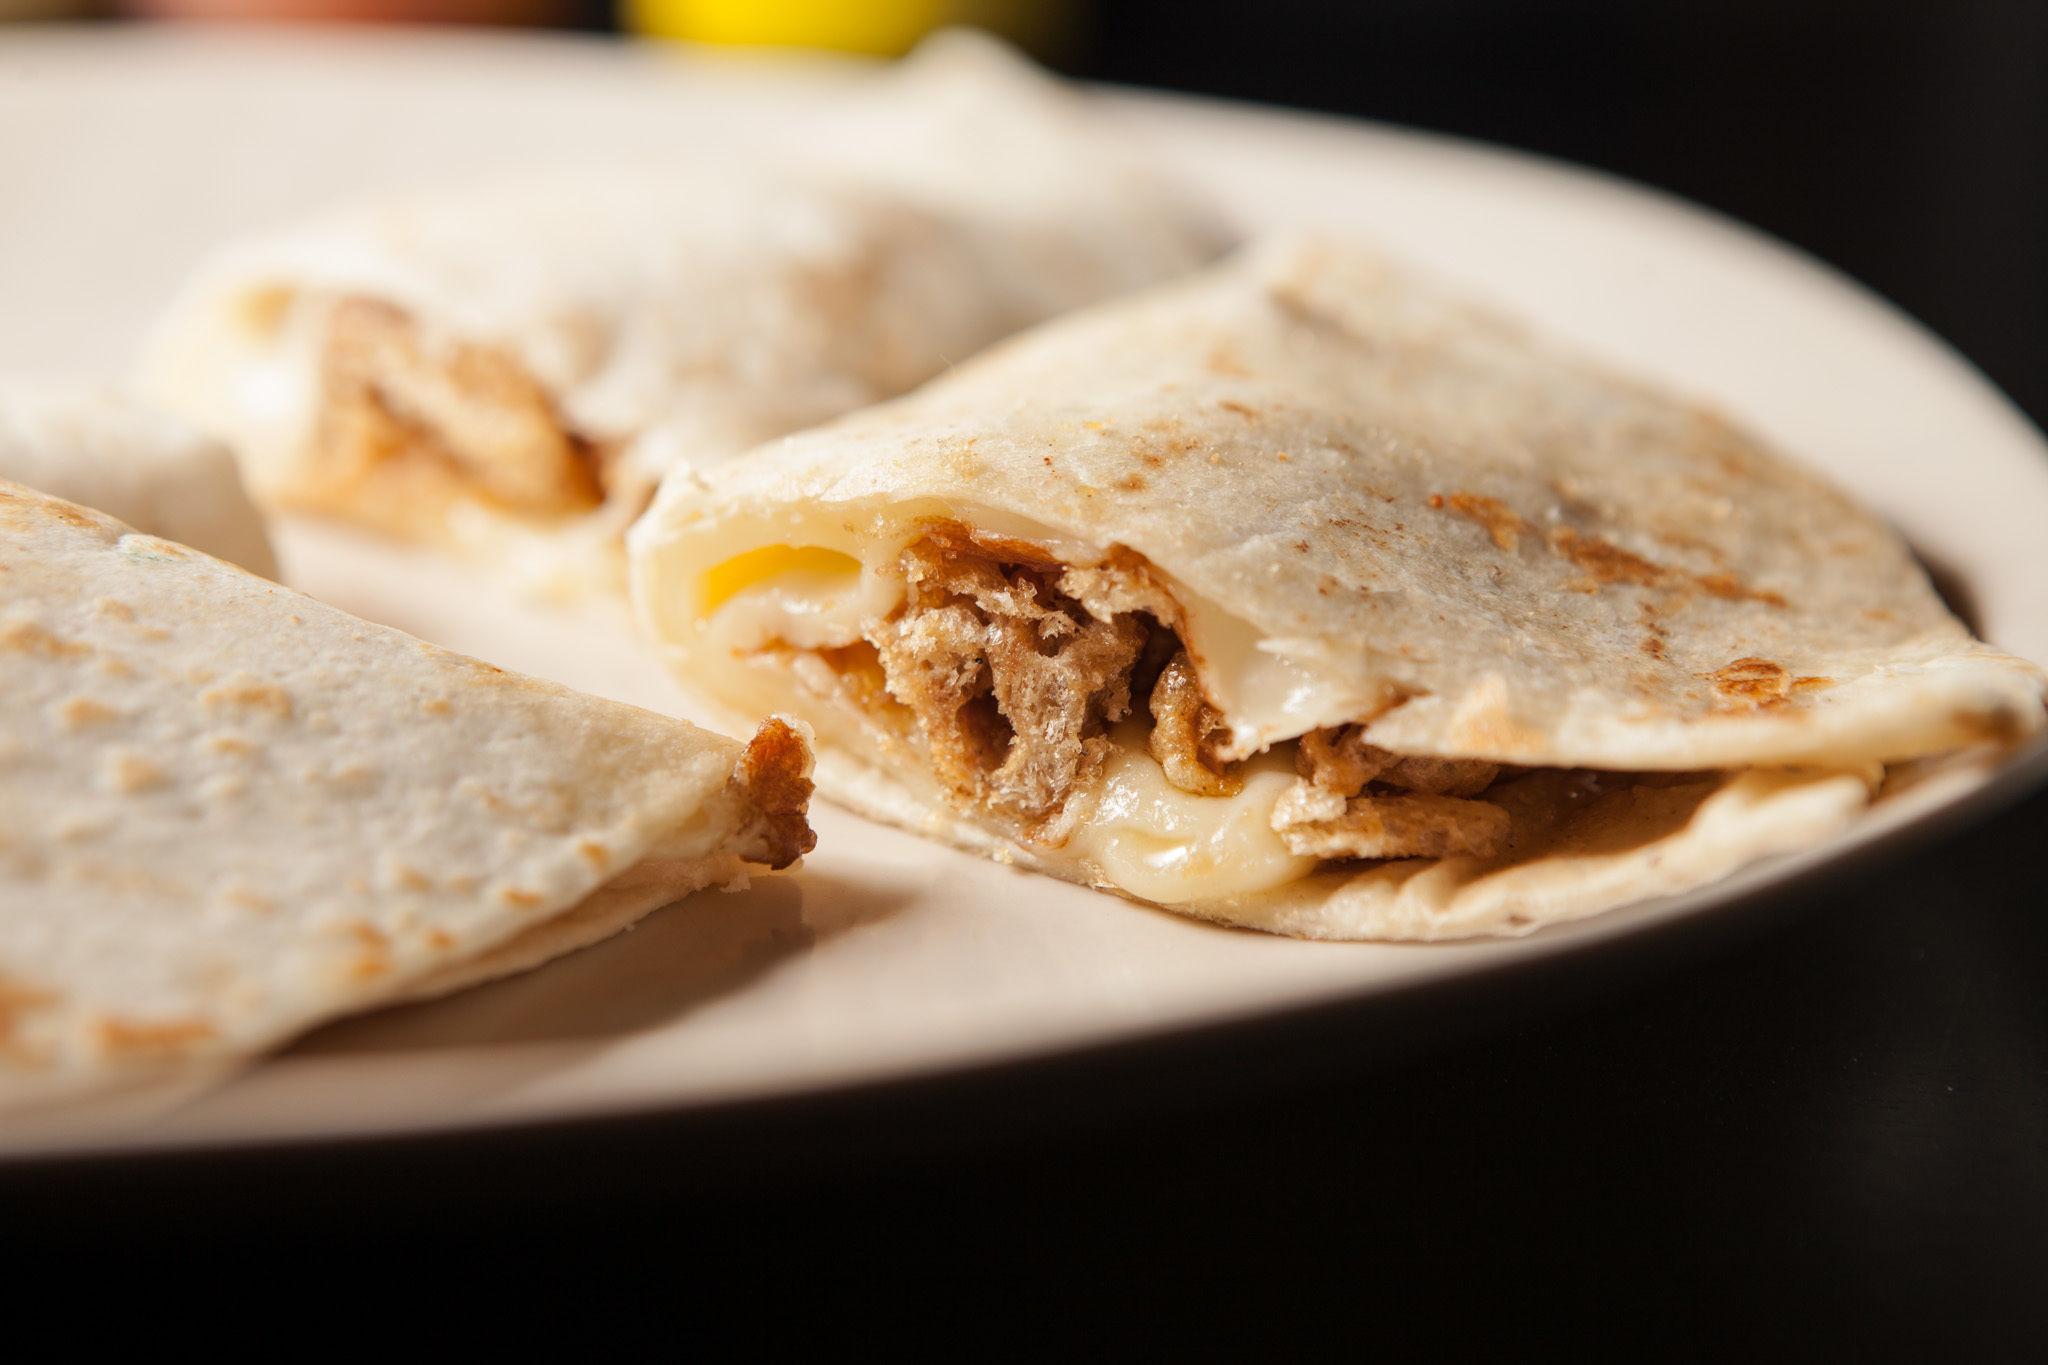 Chicharron quesadilla at Cemitas Puebla